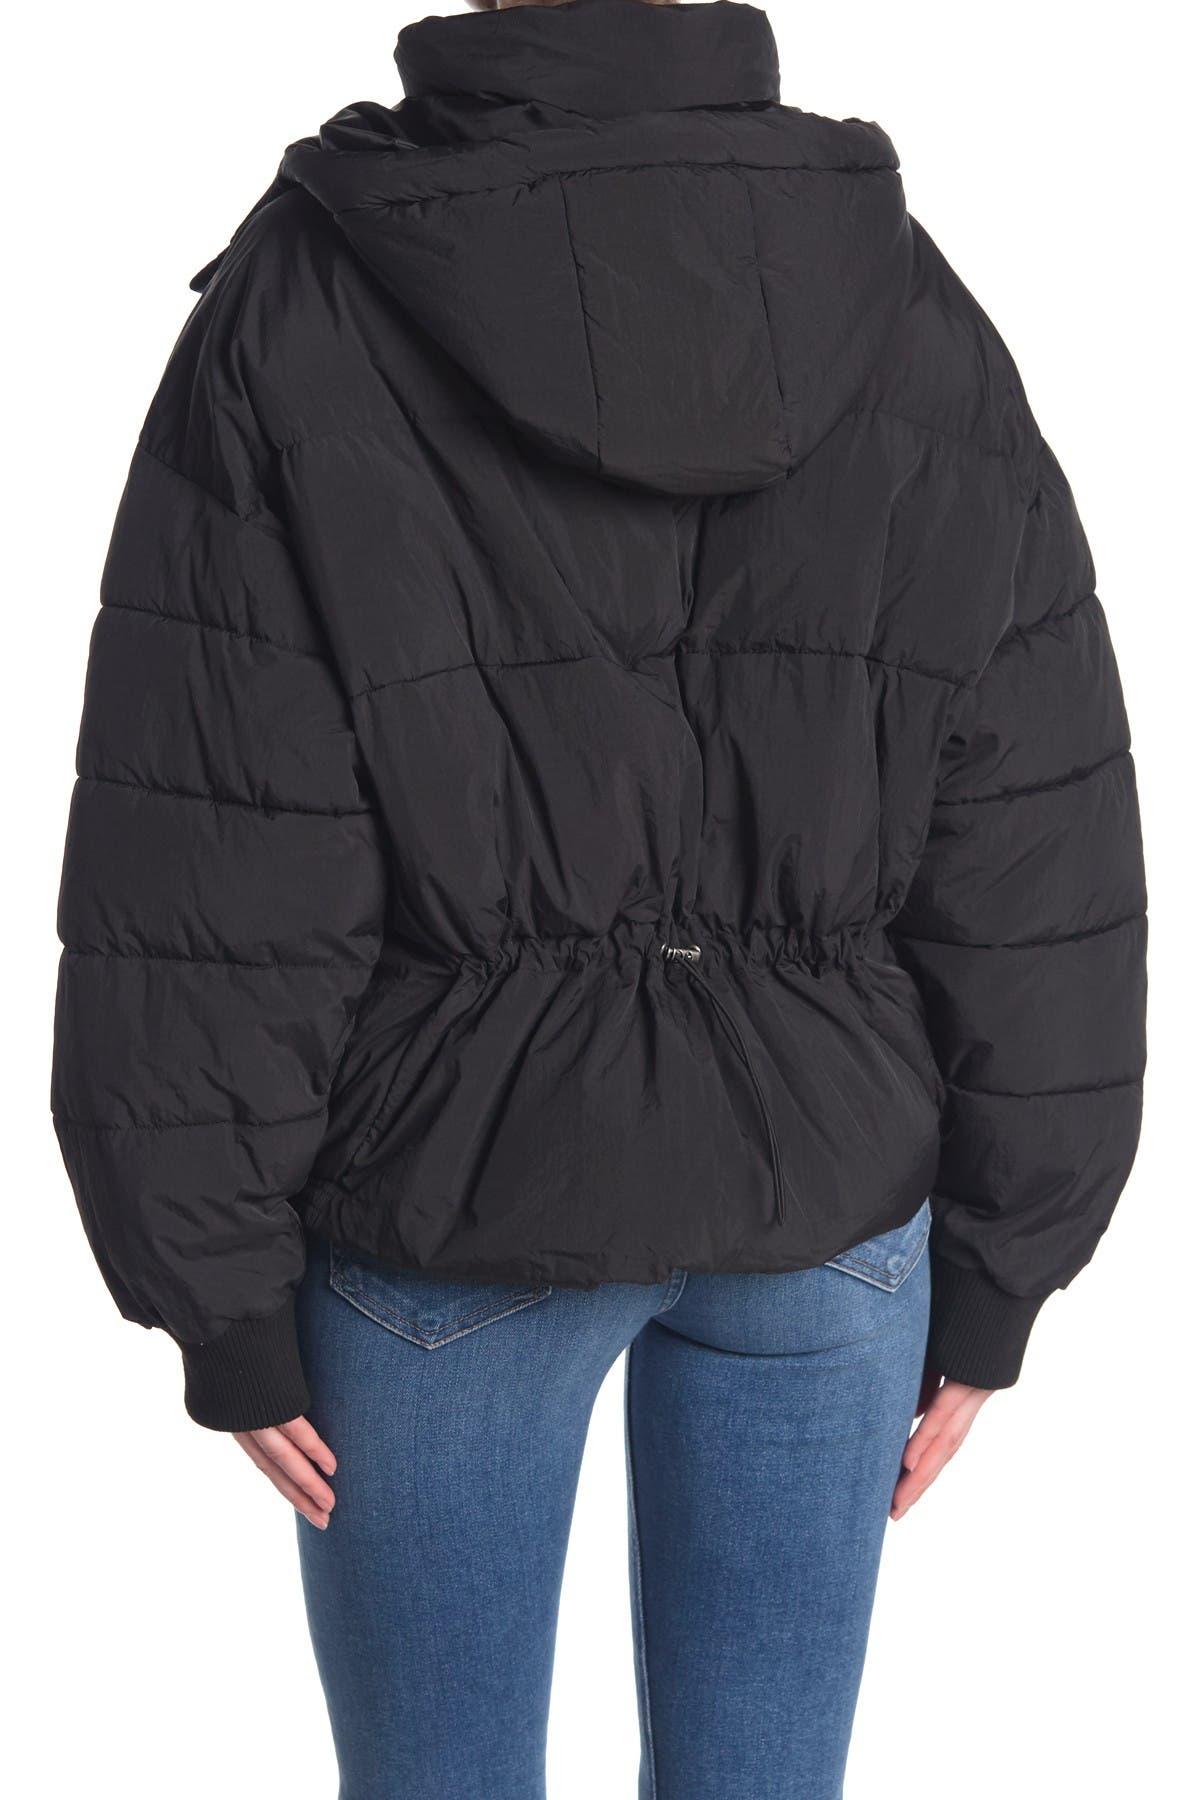 Lucky Brand Hooded Puffer Jacket